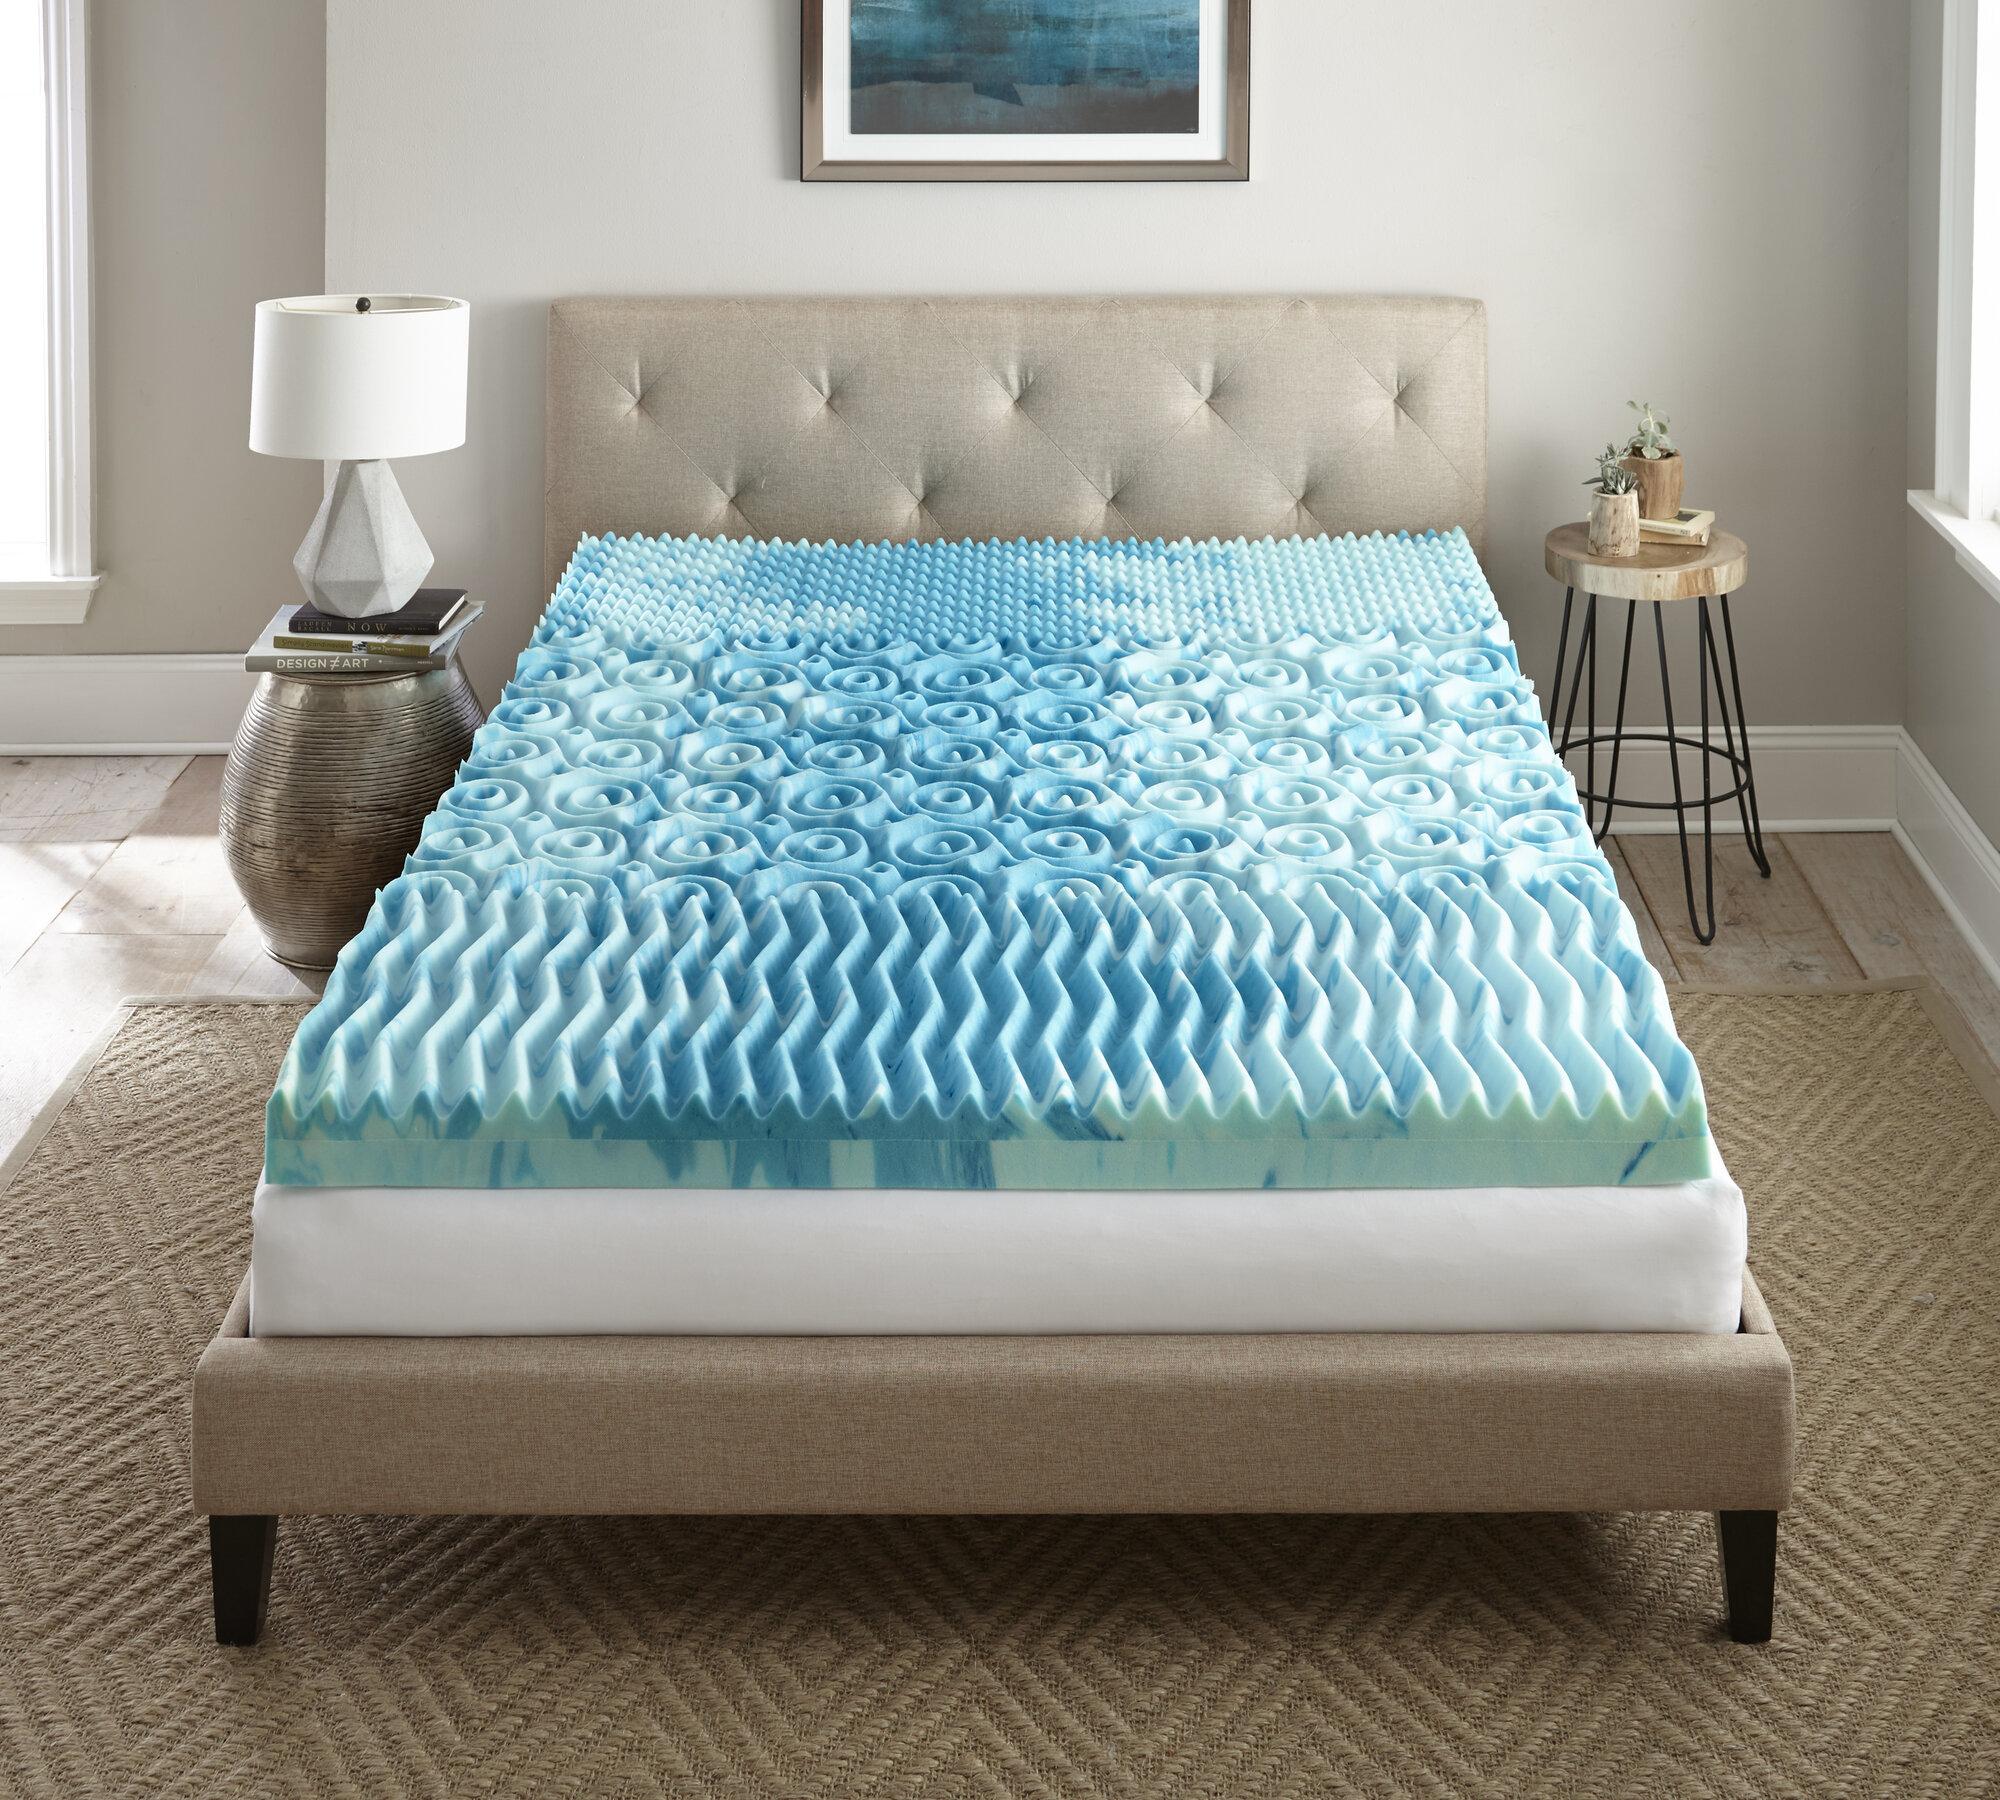 lane furniture sleep cool gellux 4 memory foam mattress. Black Bedroom Furniture Sets. Home Design Ideas